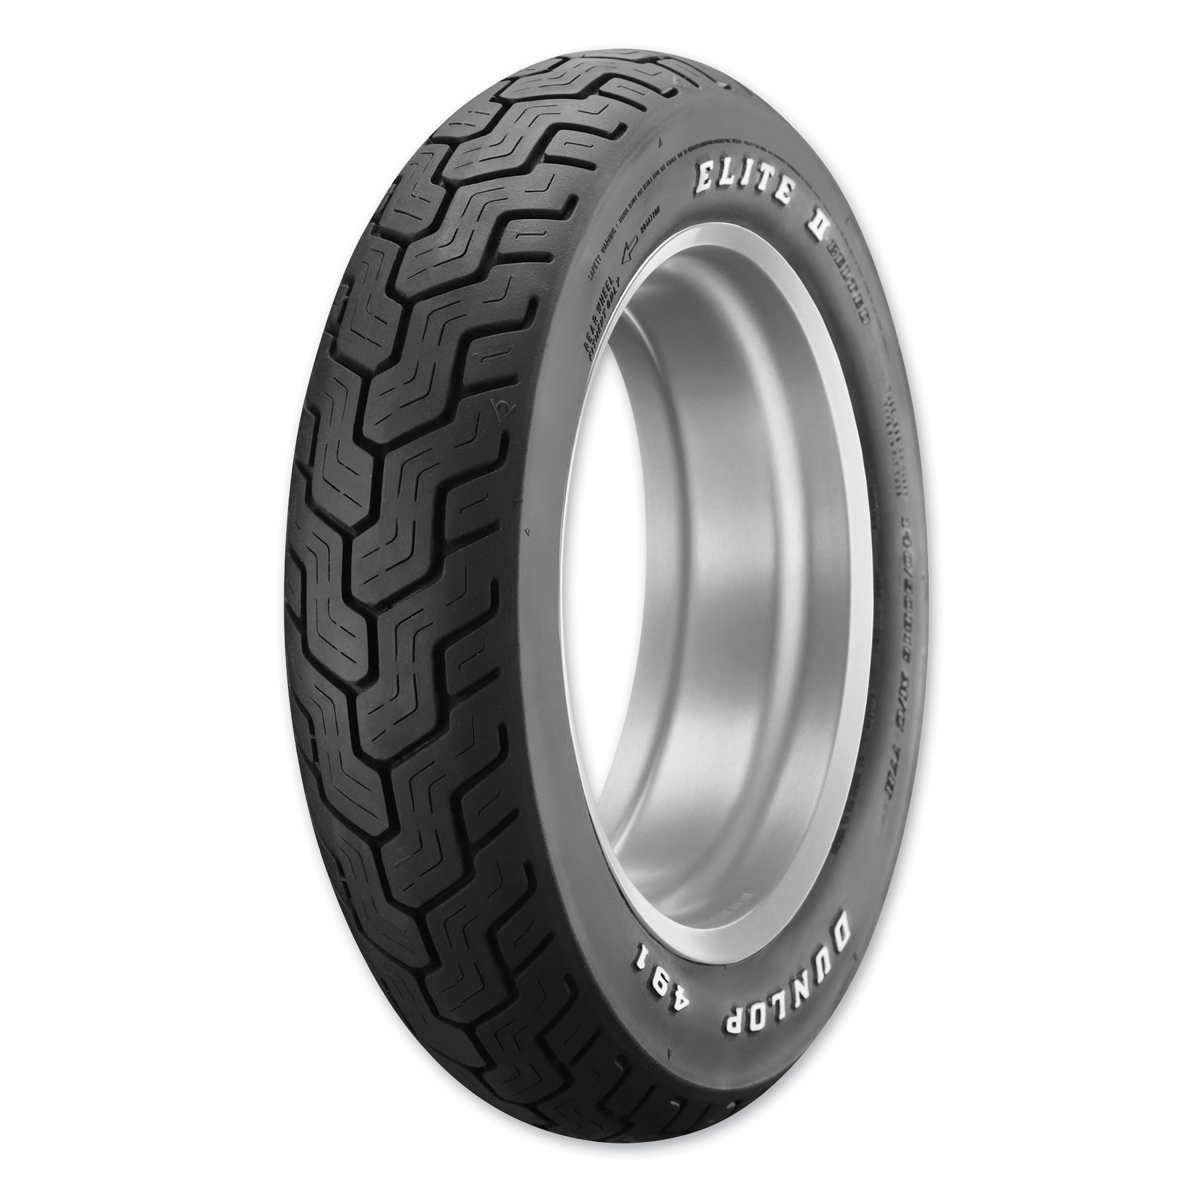 Dunlop d491 elite ii 140 90b16 rear tire 921 850 jp for Dunlop white letter motorcycle tires